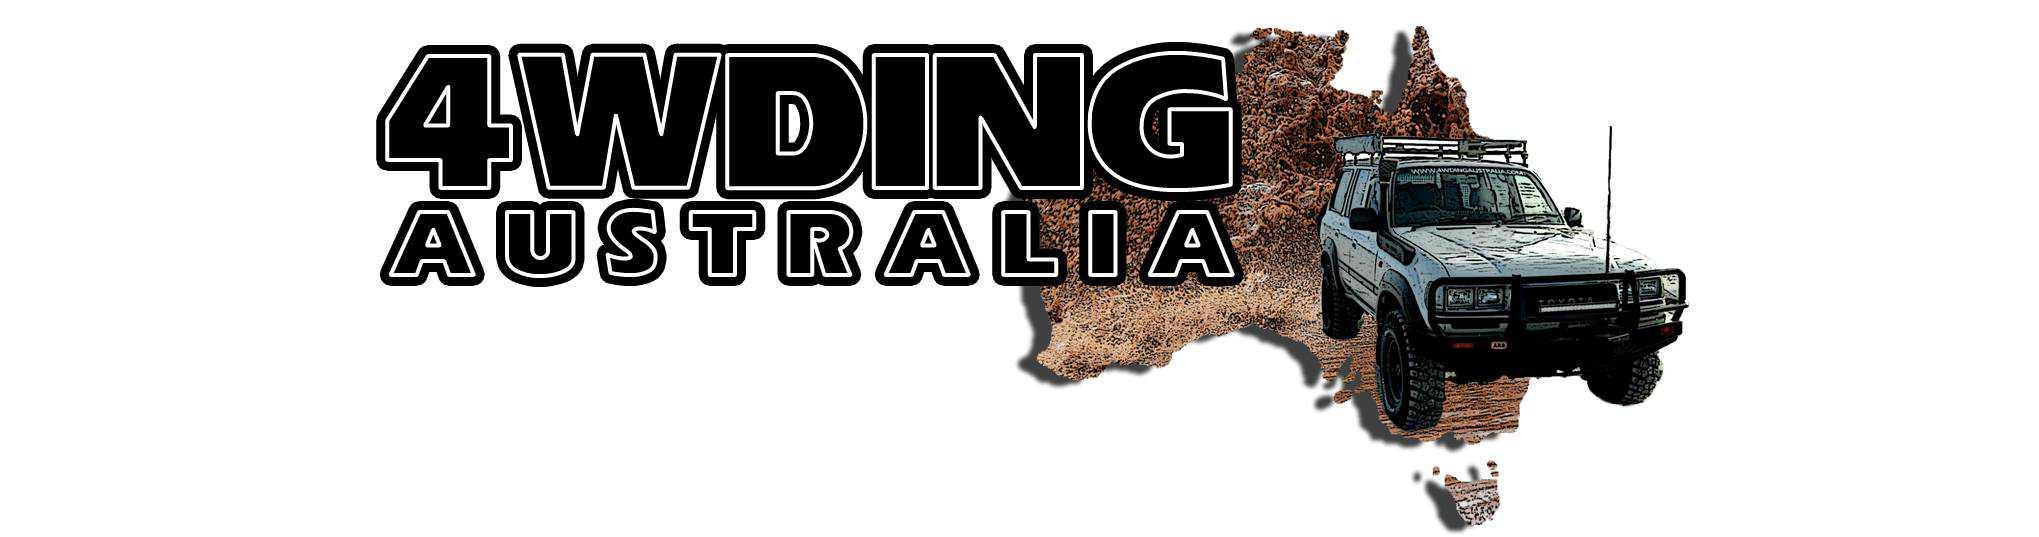 4WDing Australia header image